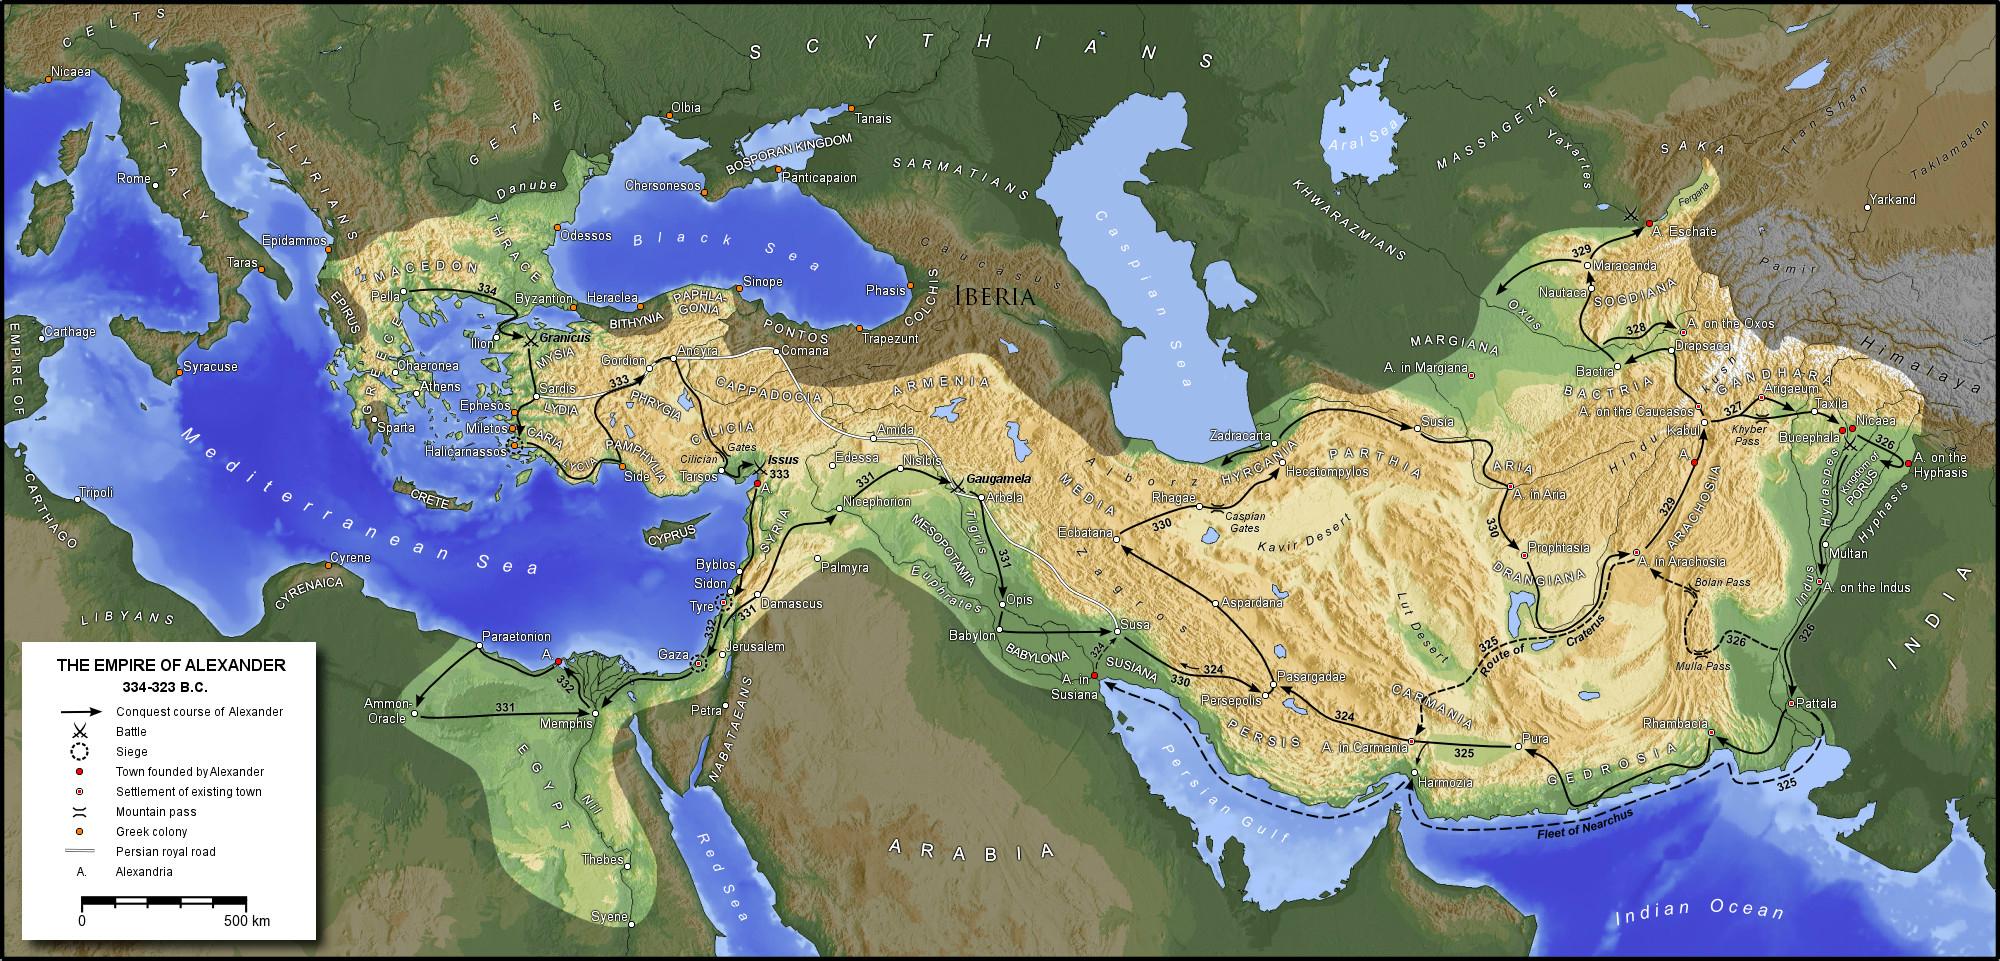 The Empire of Alexander